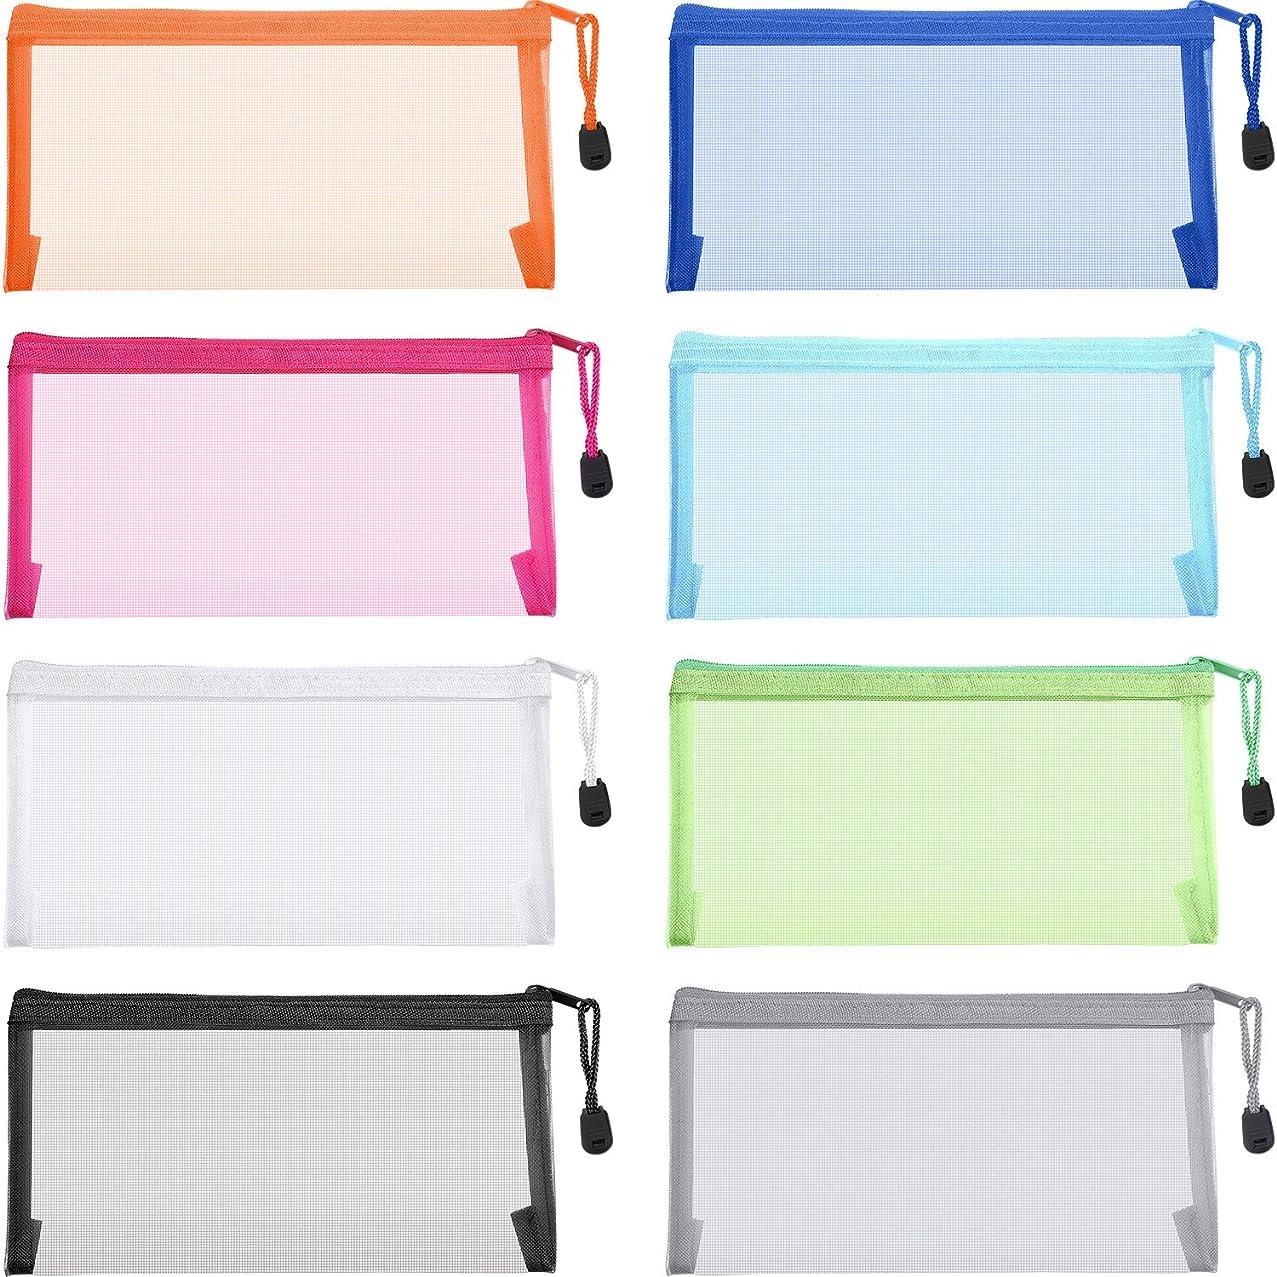 TecUnite 8 Pieces Zipper Mesh Pouch Invoice File Bag A6 Size for Pencil Pouch Pen Bag Cosmetics Supplies Travel Accessories